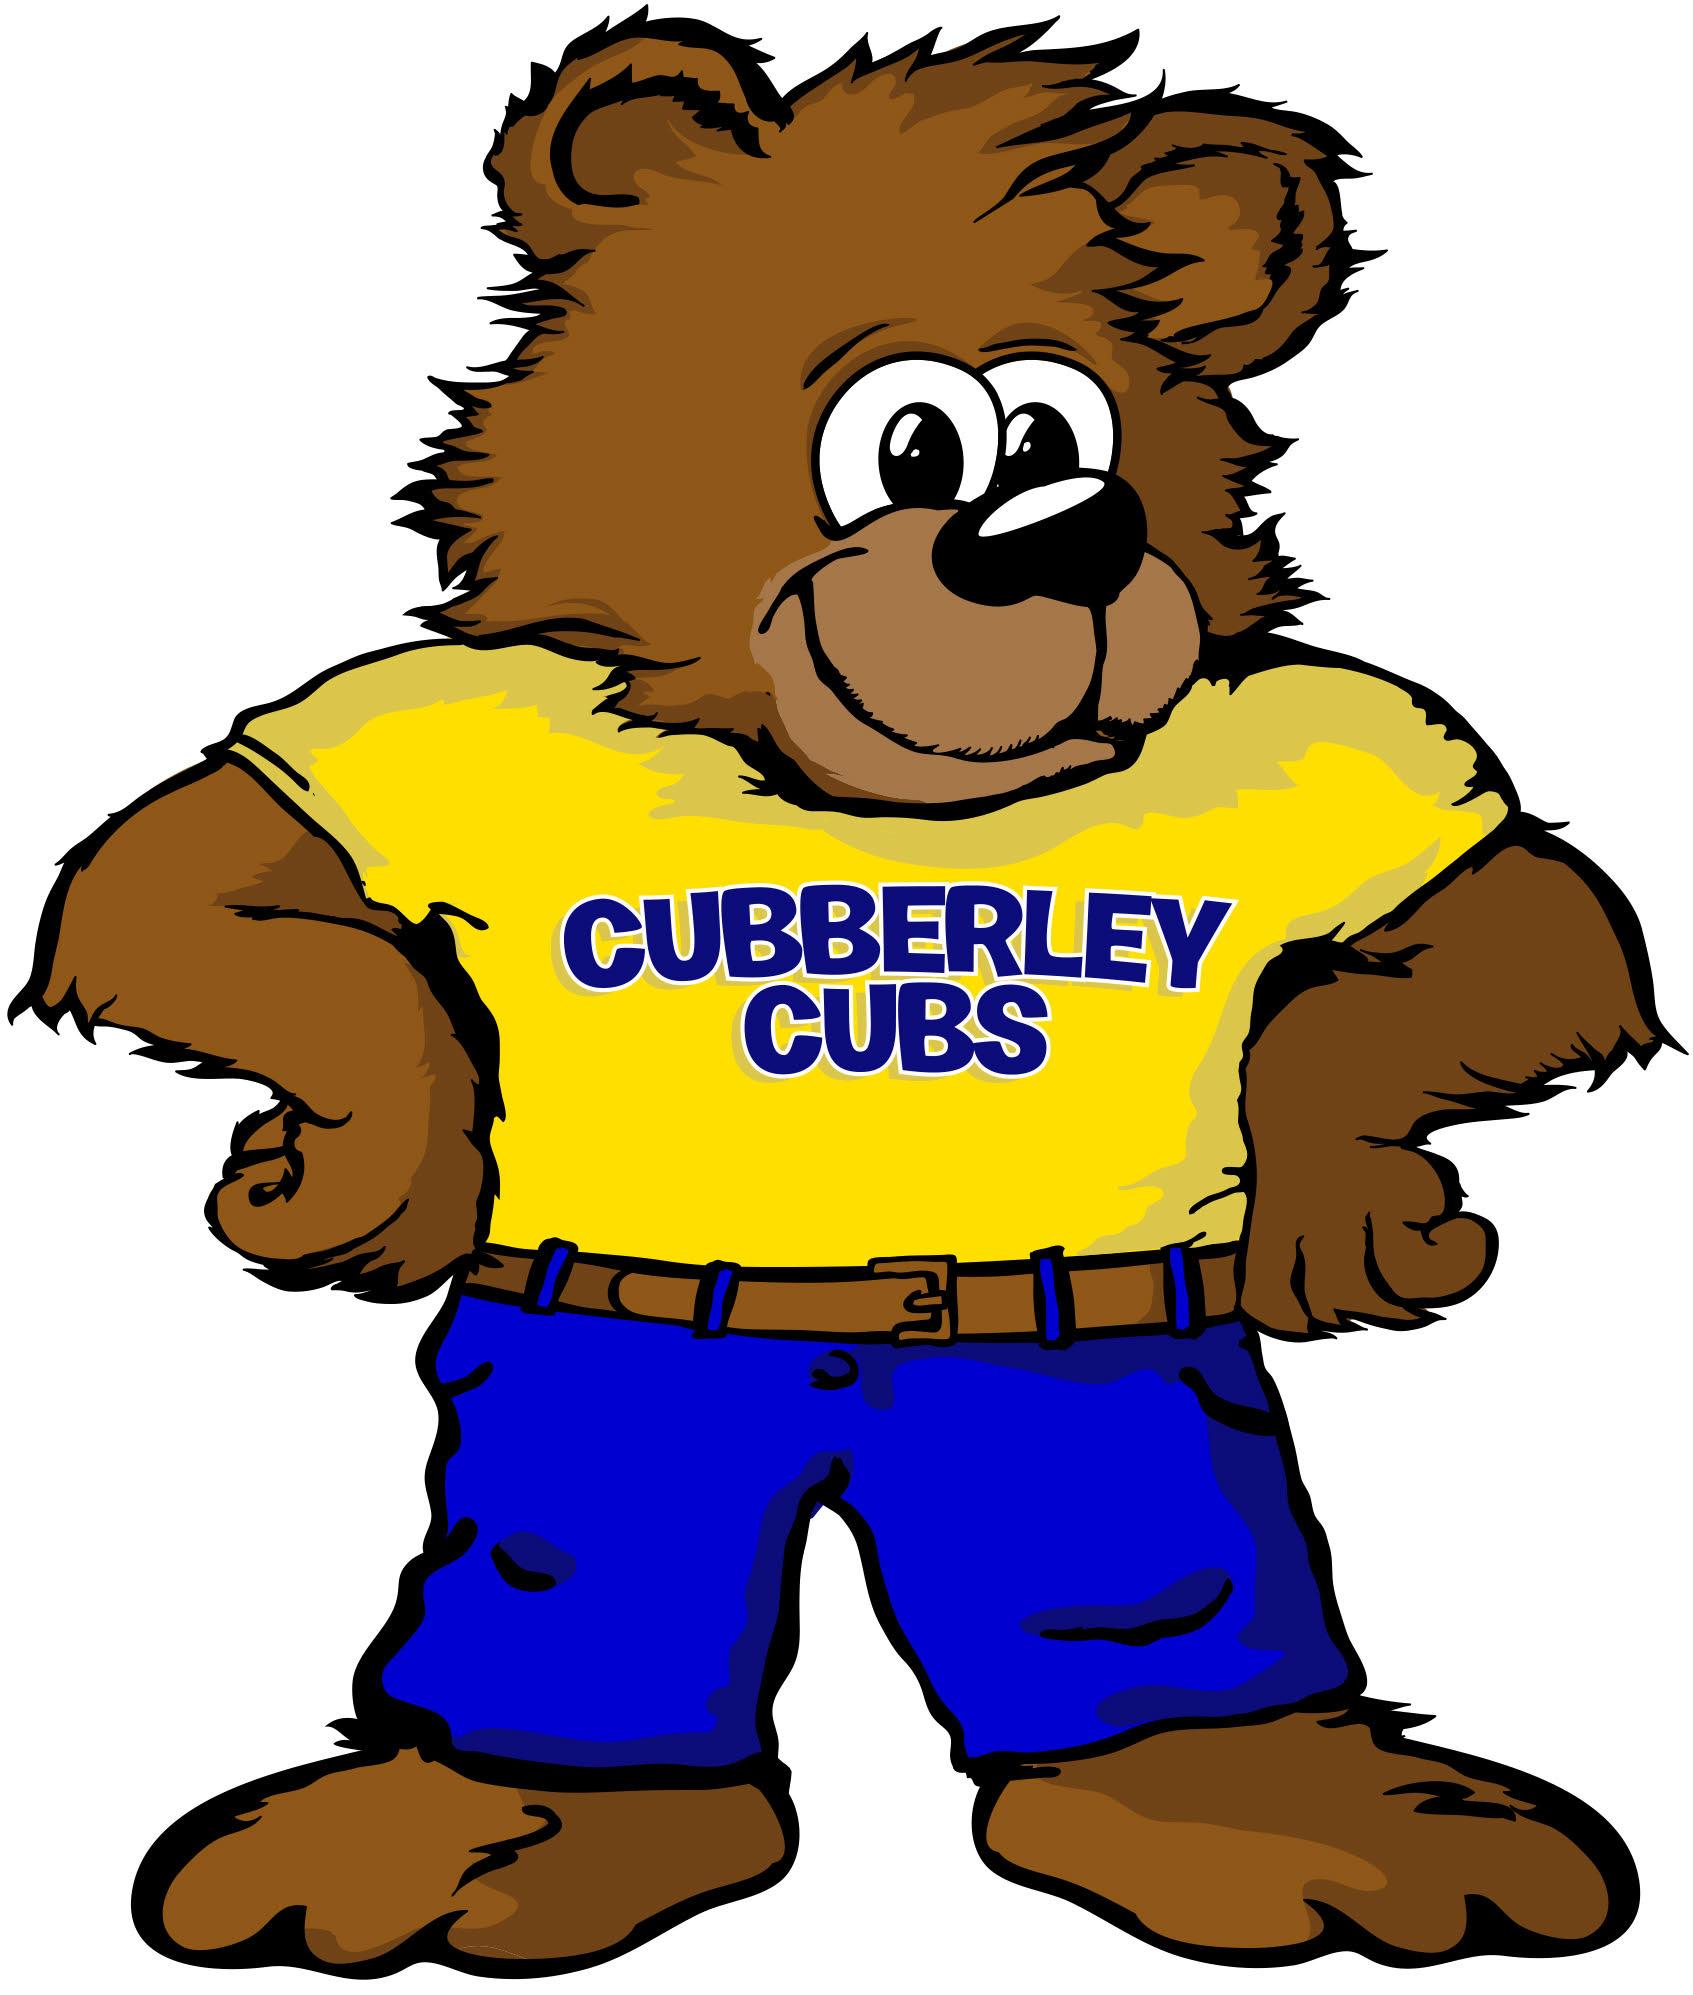 Cub (New Style).jpg